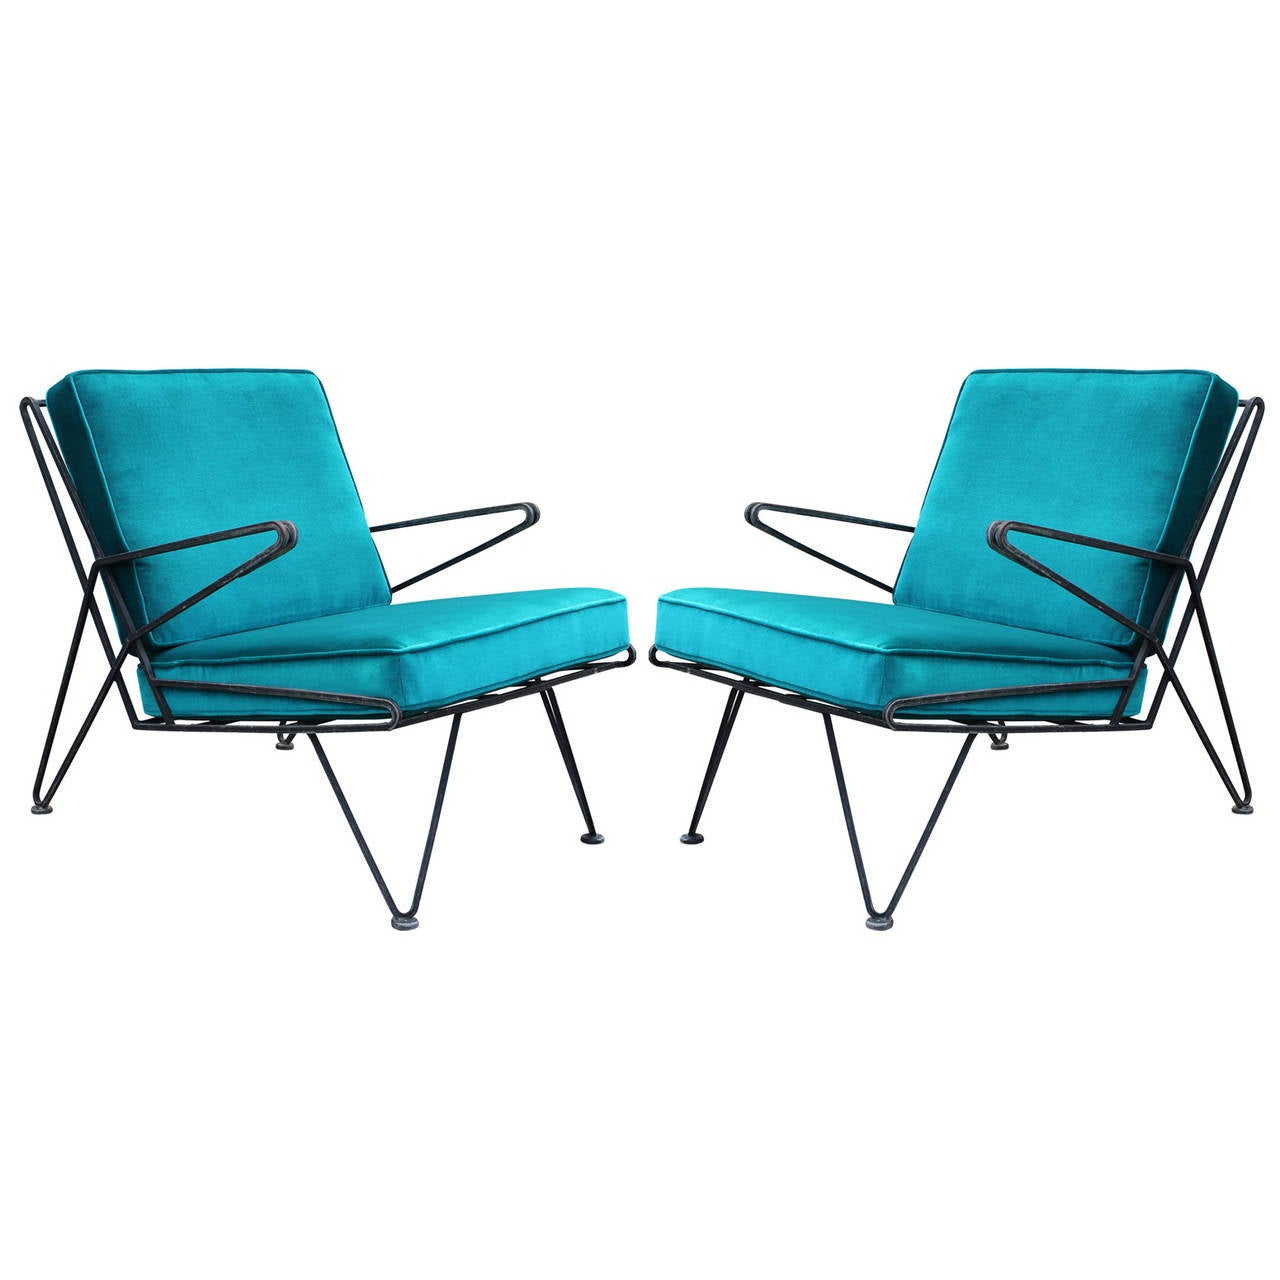 Phenomenal Pair of Teal Velvet Italian Style Mid-Century Modern Lounge Chairs